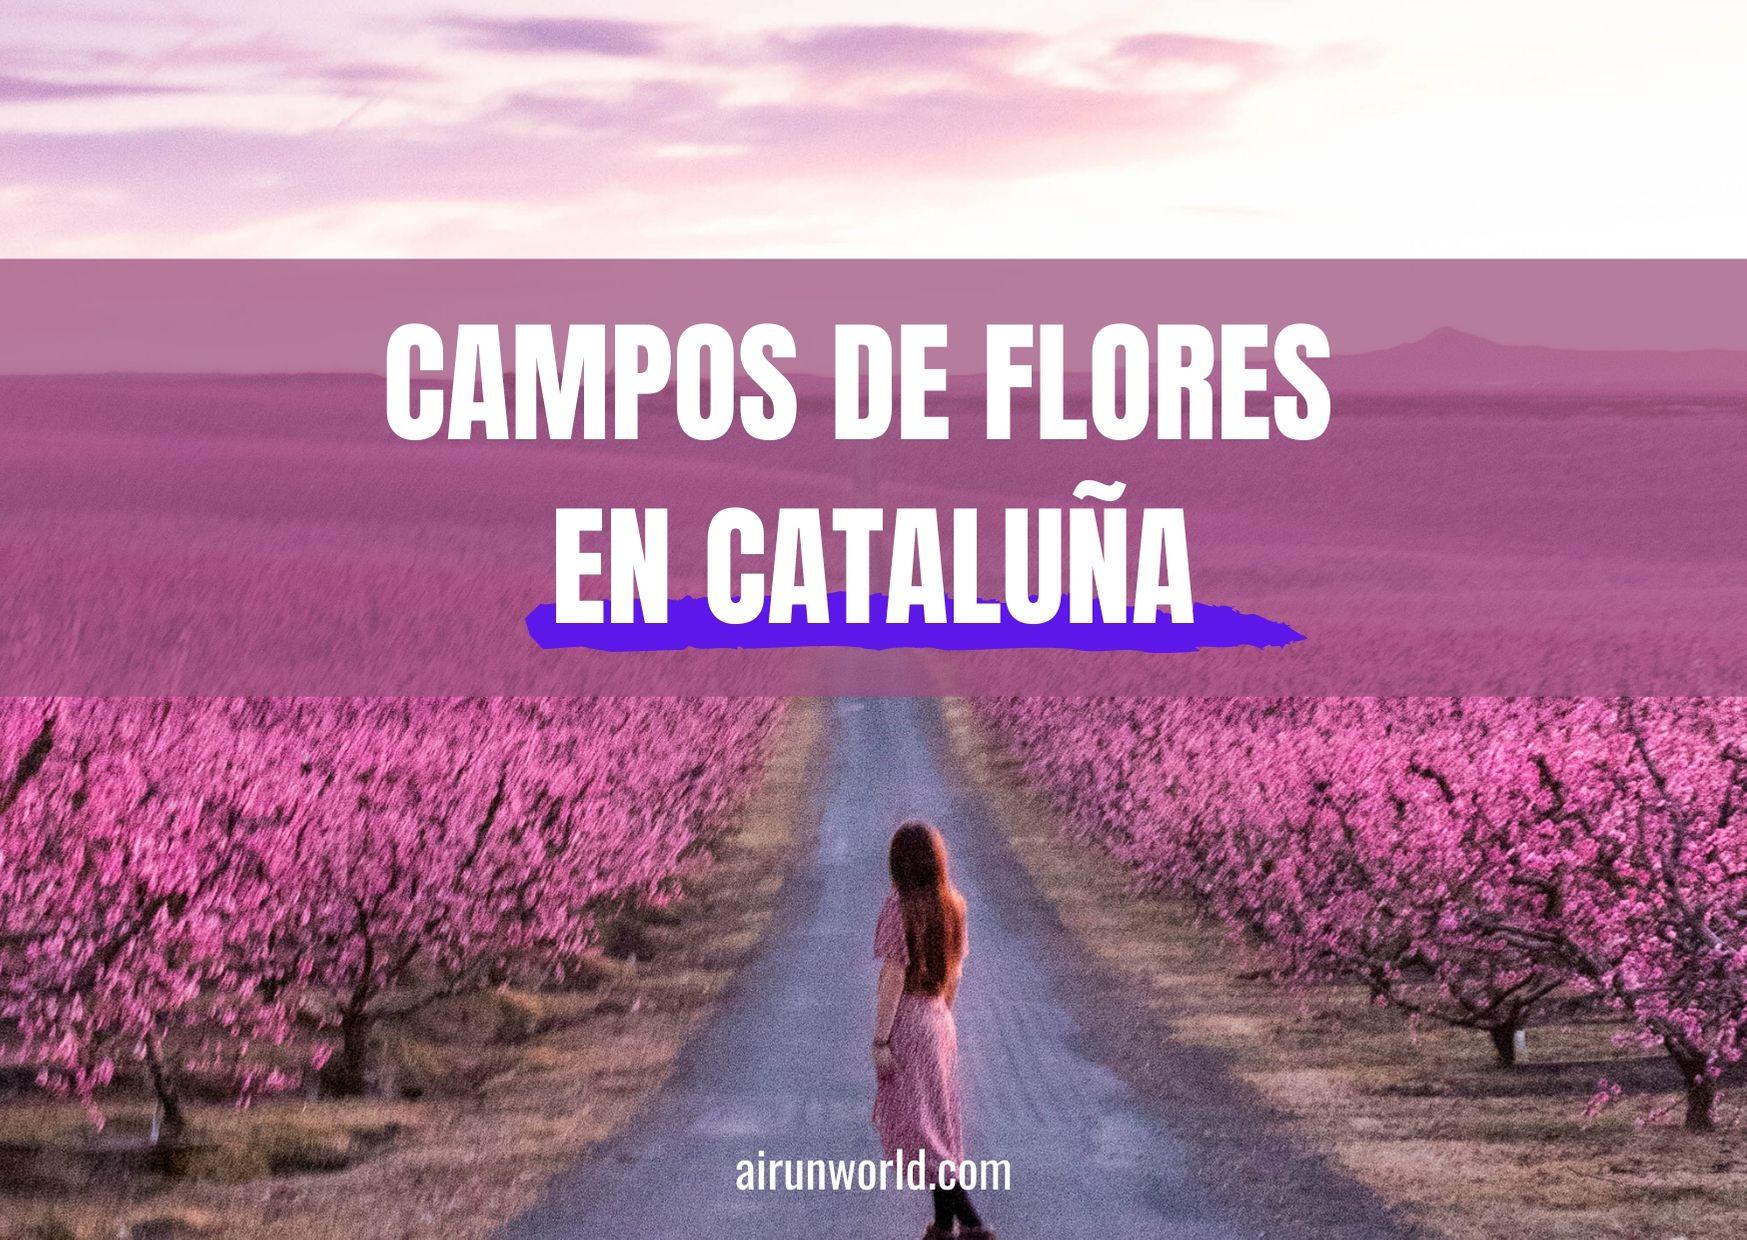 campos de flores en cataluña